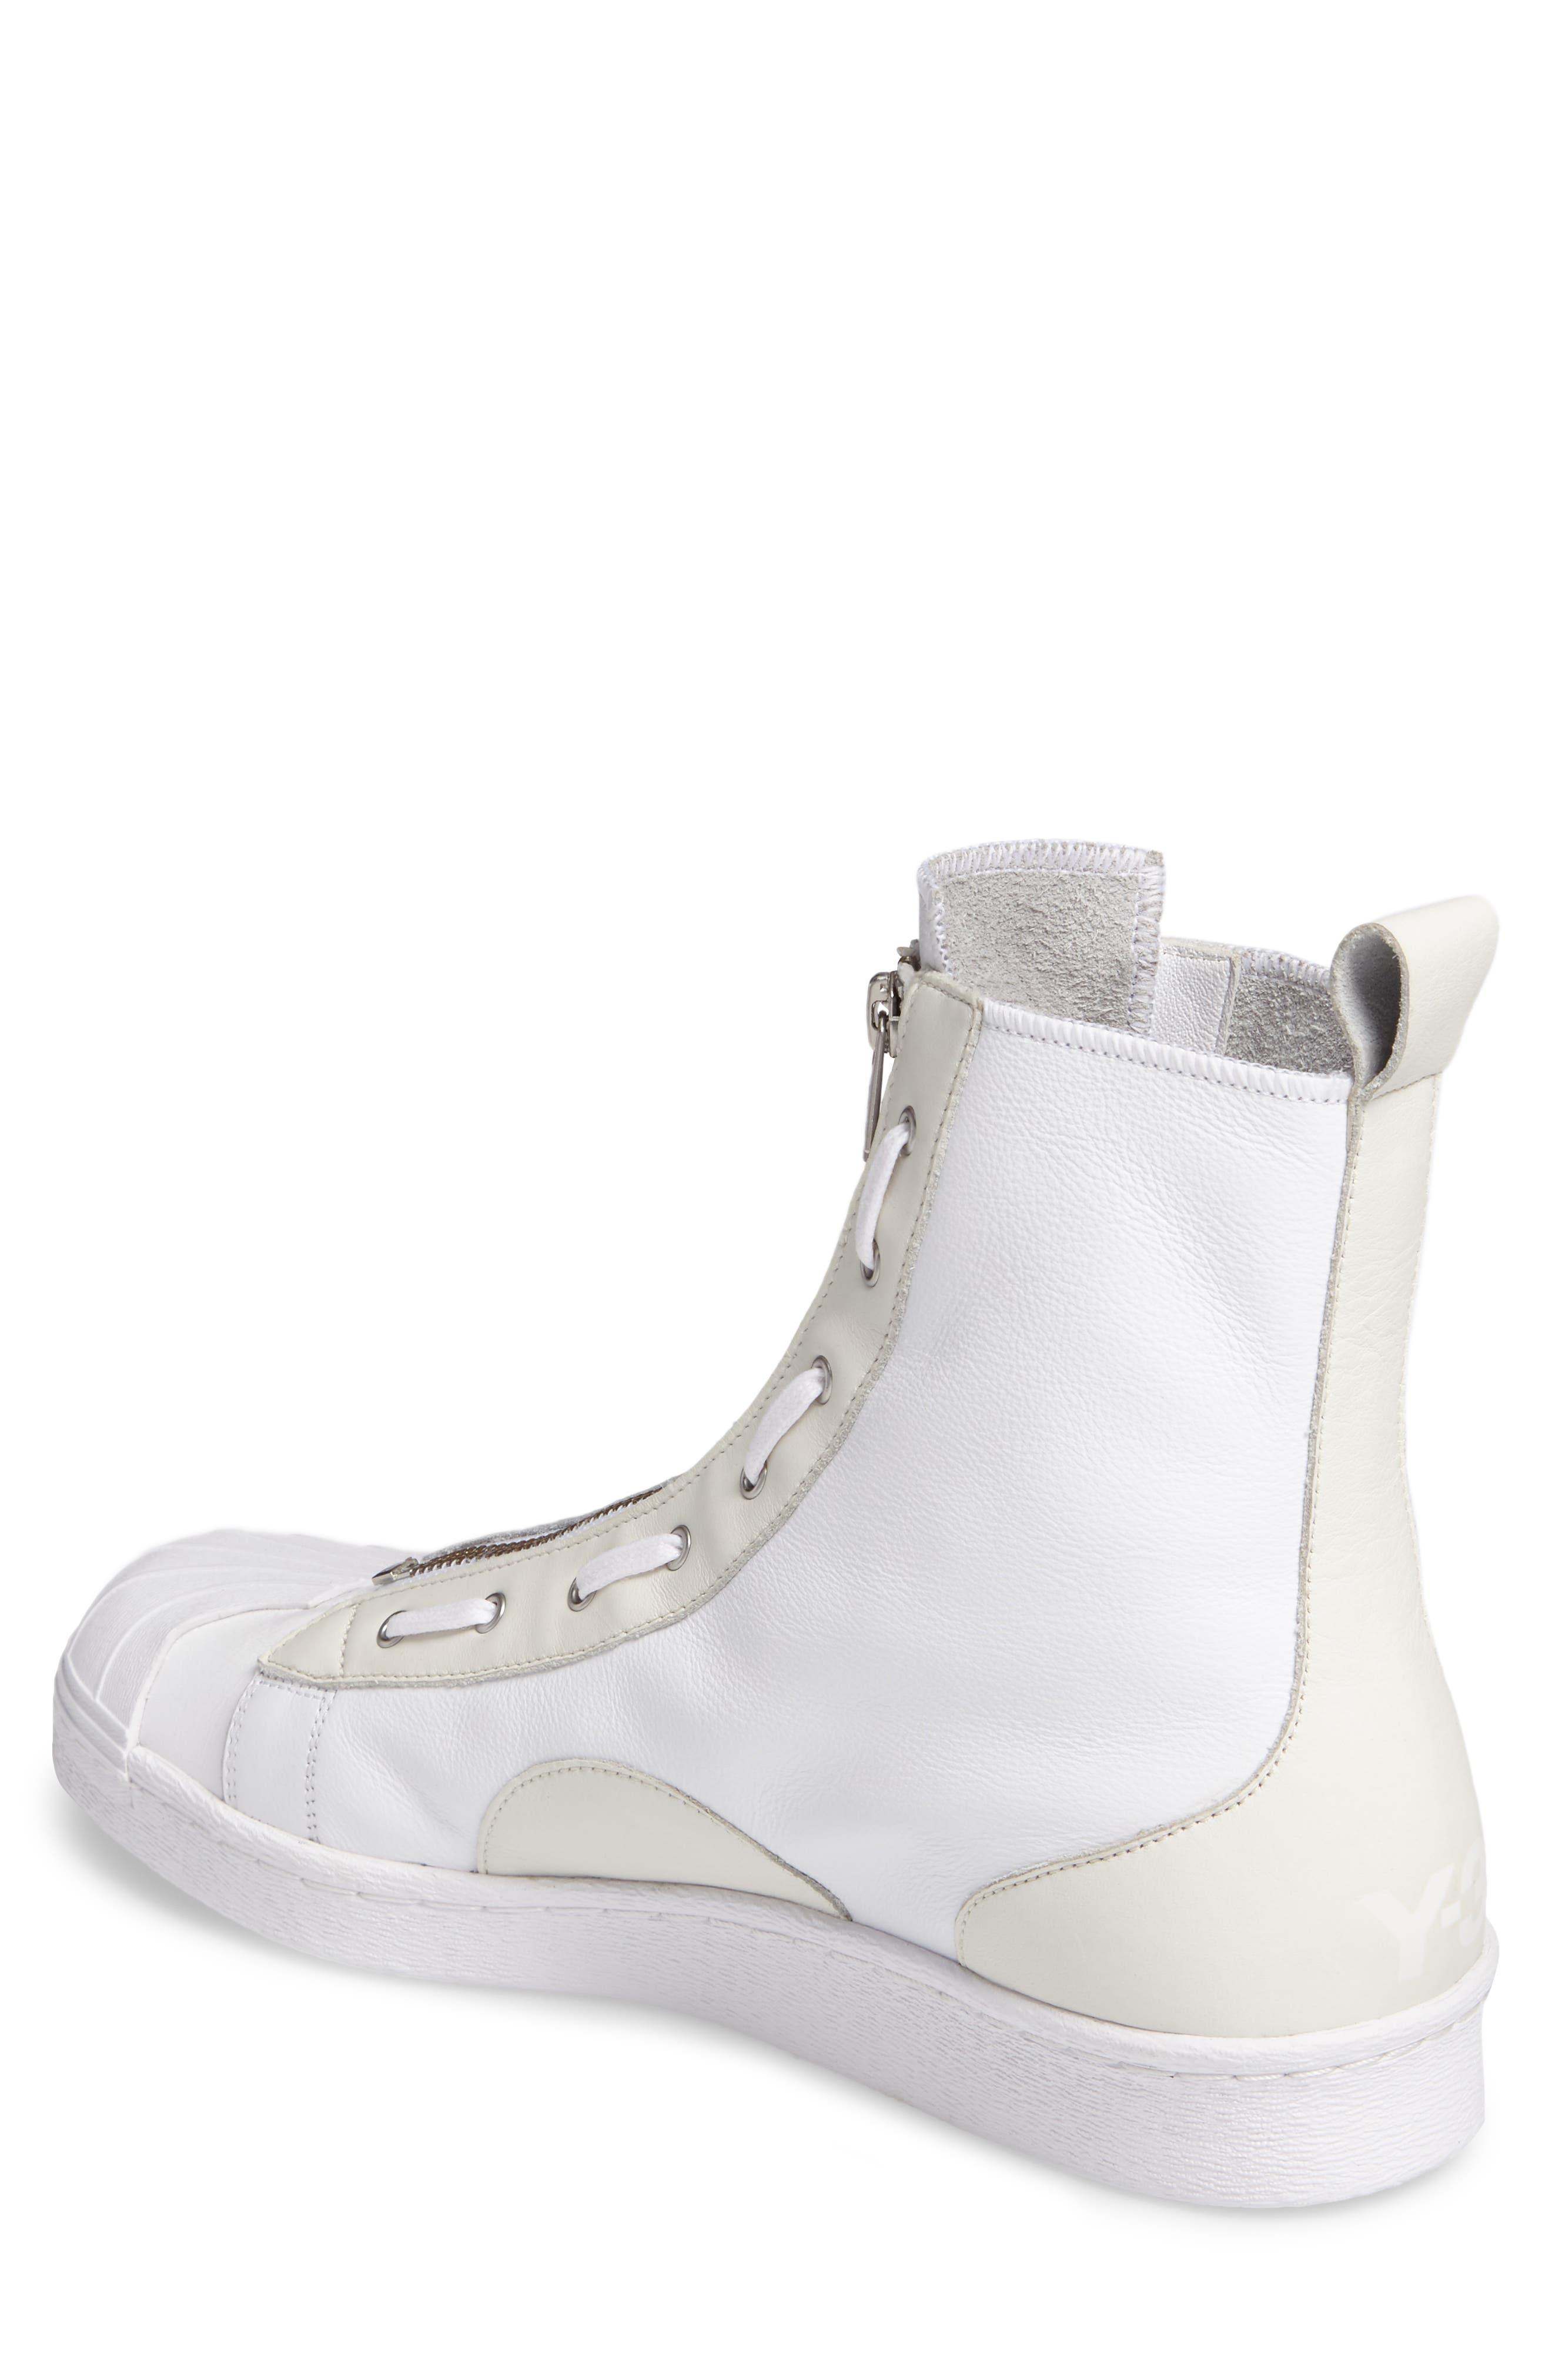 Alternate Image 2  - Y-3 'Pro' High Top Sneaker (Men)